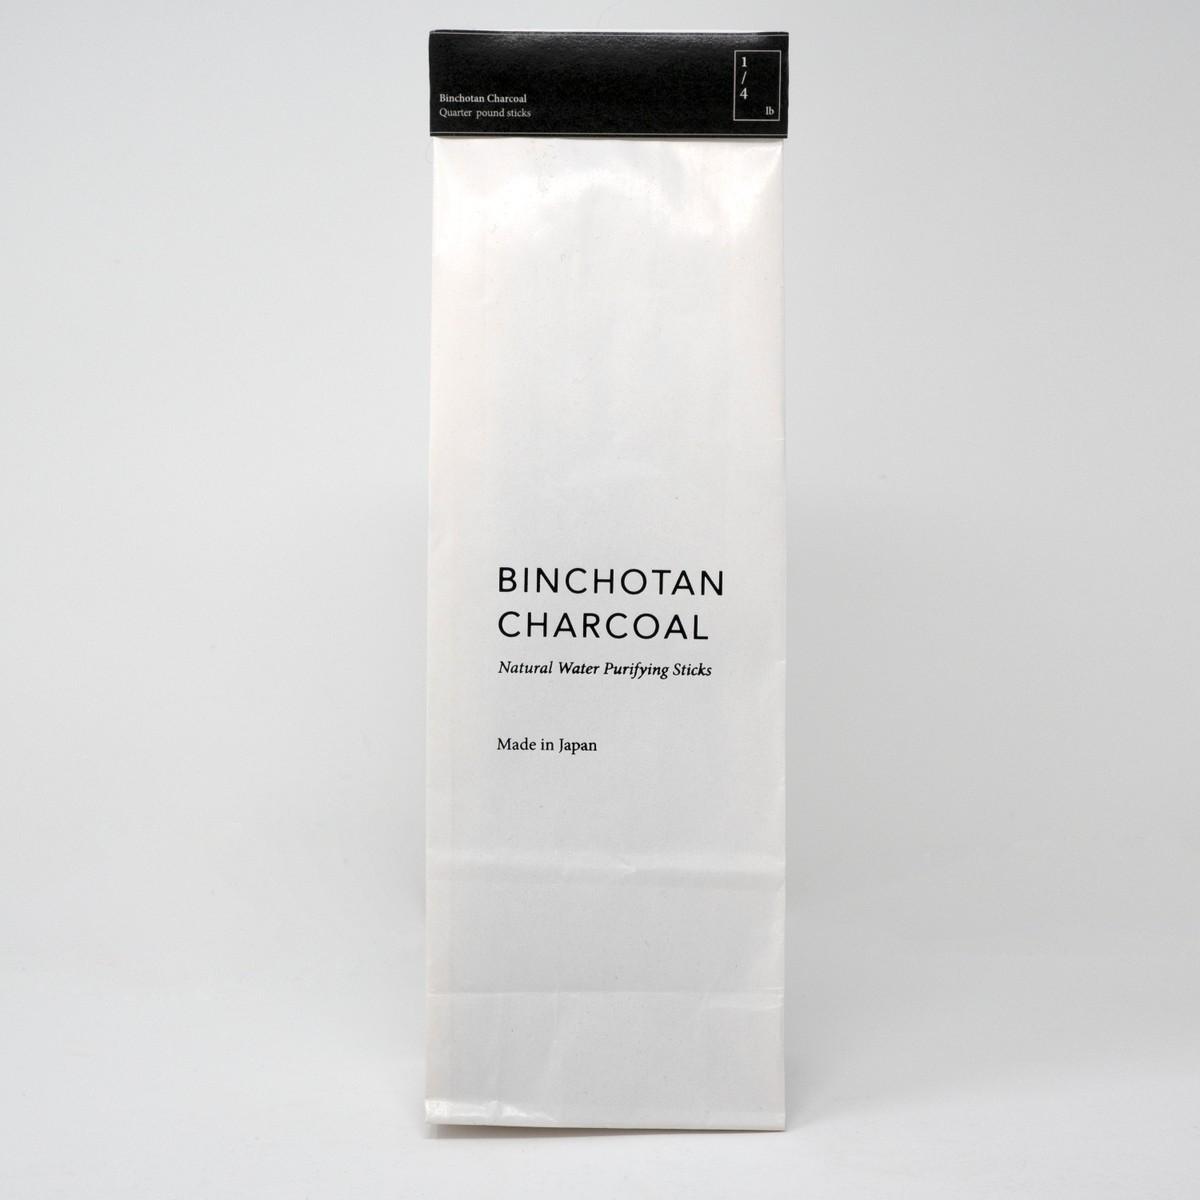 Photo of Binchotan Charcoal Sticks